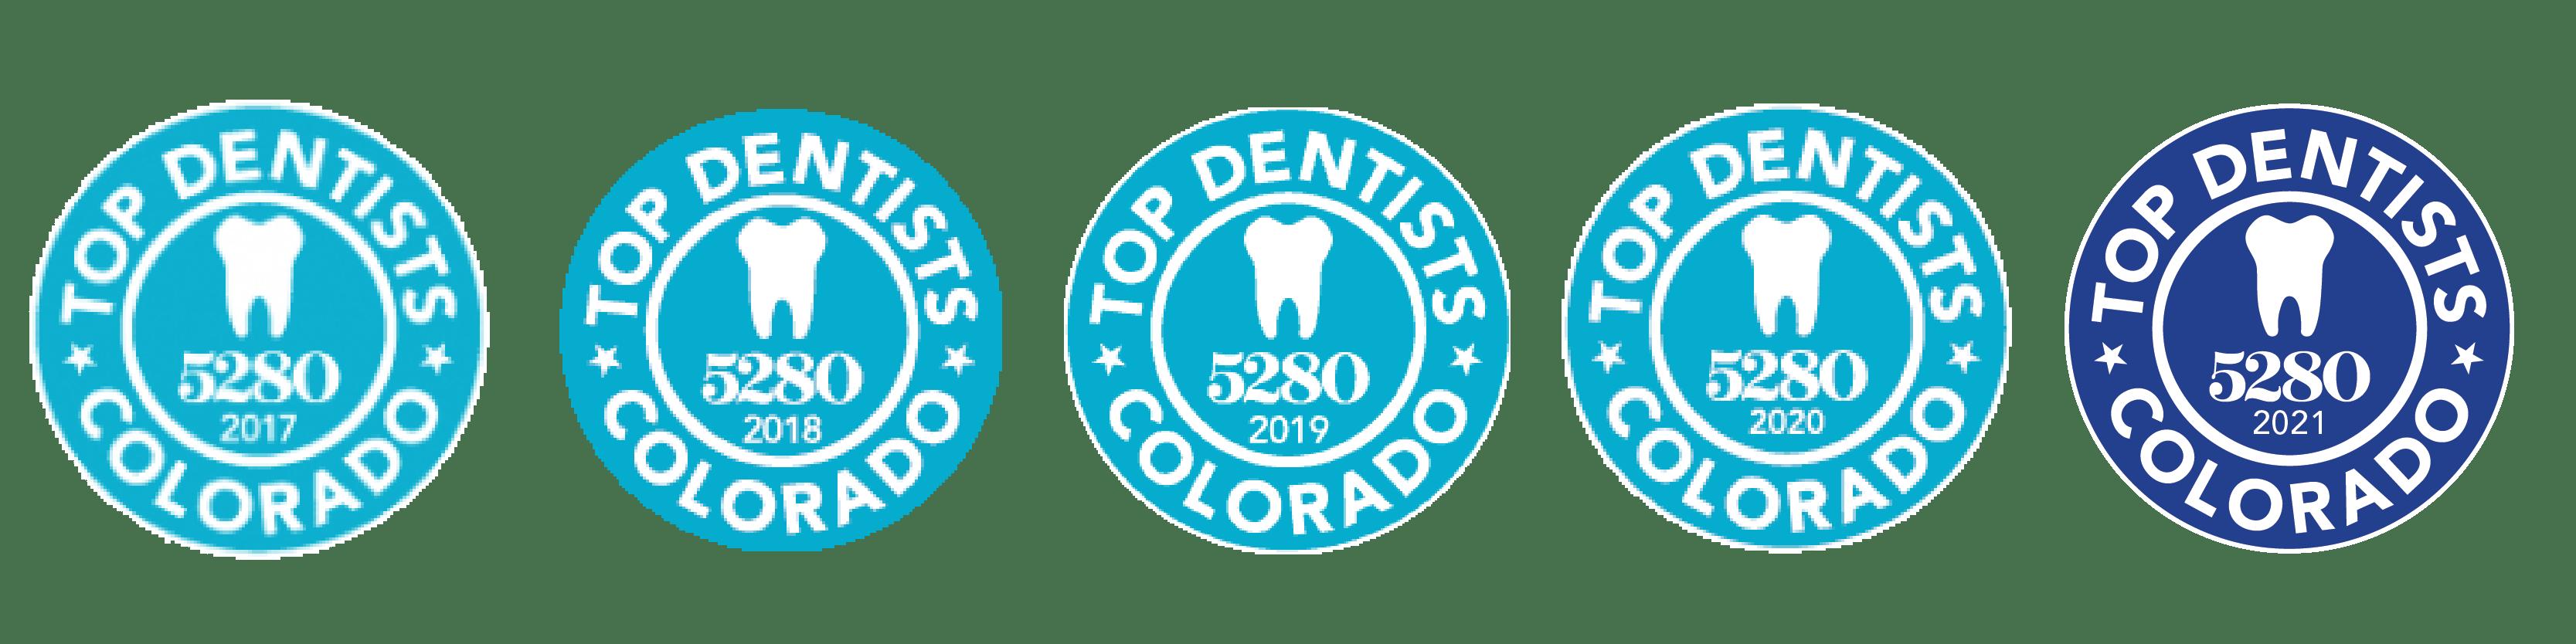 5280 Top Dentist Logos